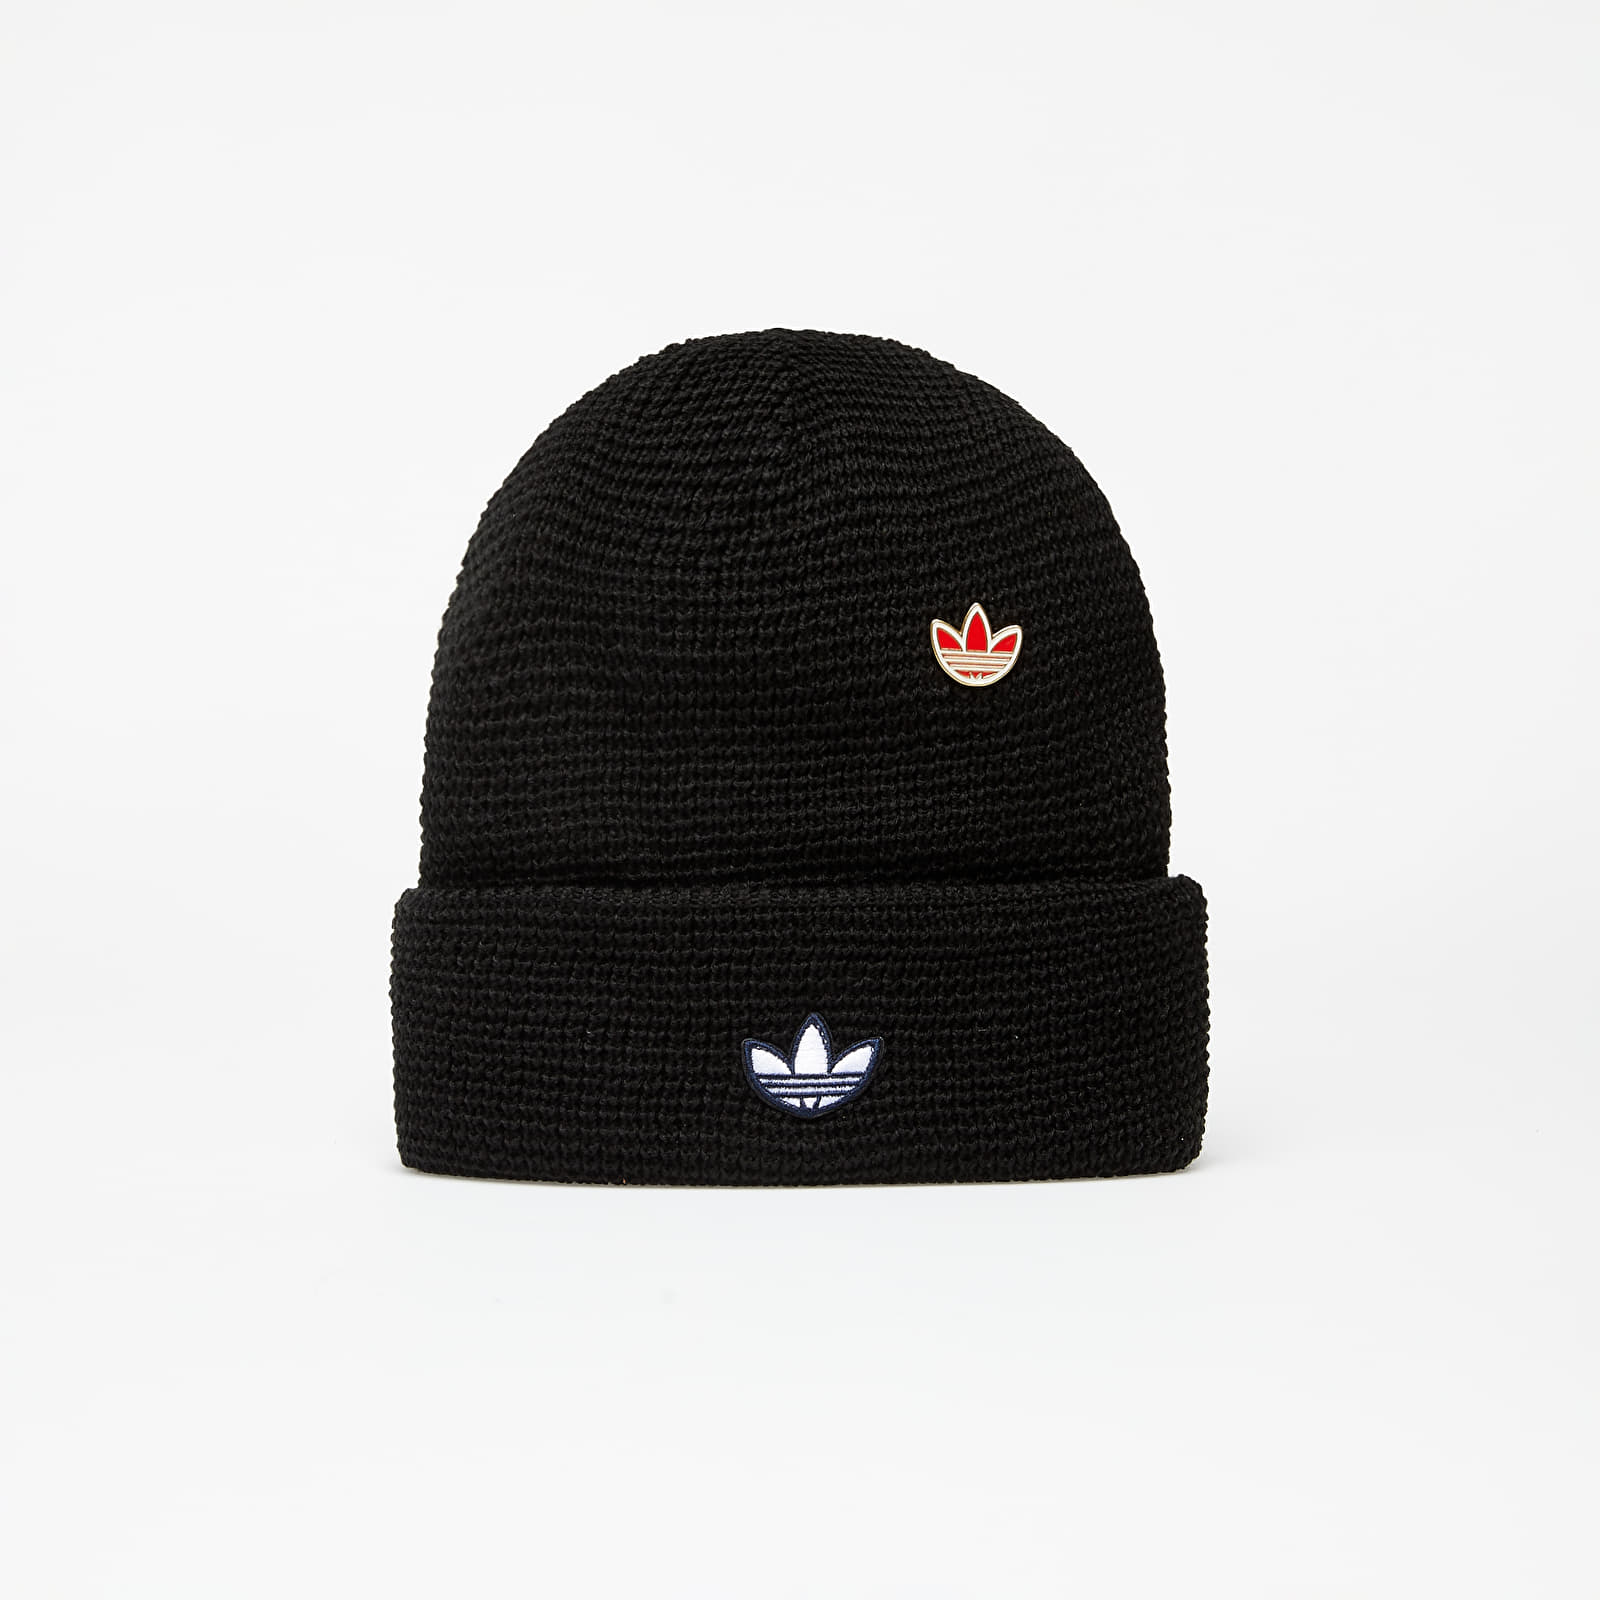 Hats adidas Adicolor Waffle Cuff Knit Black